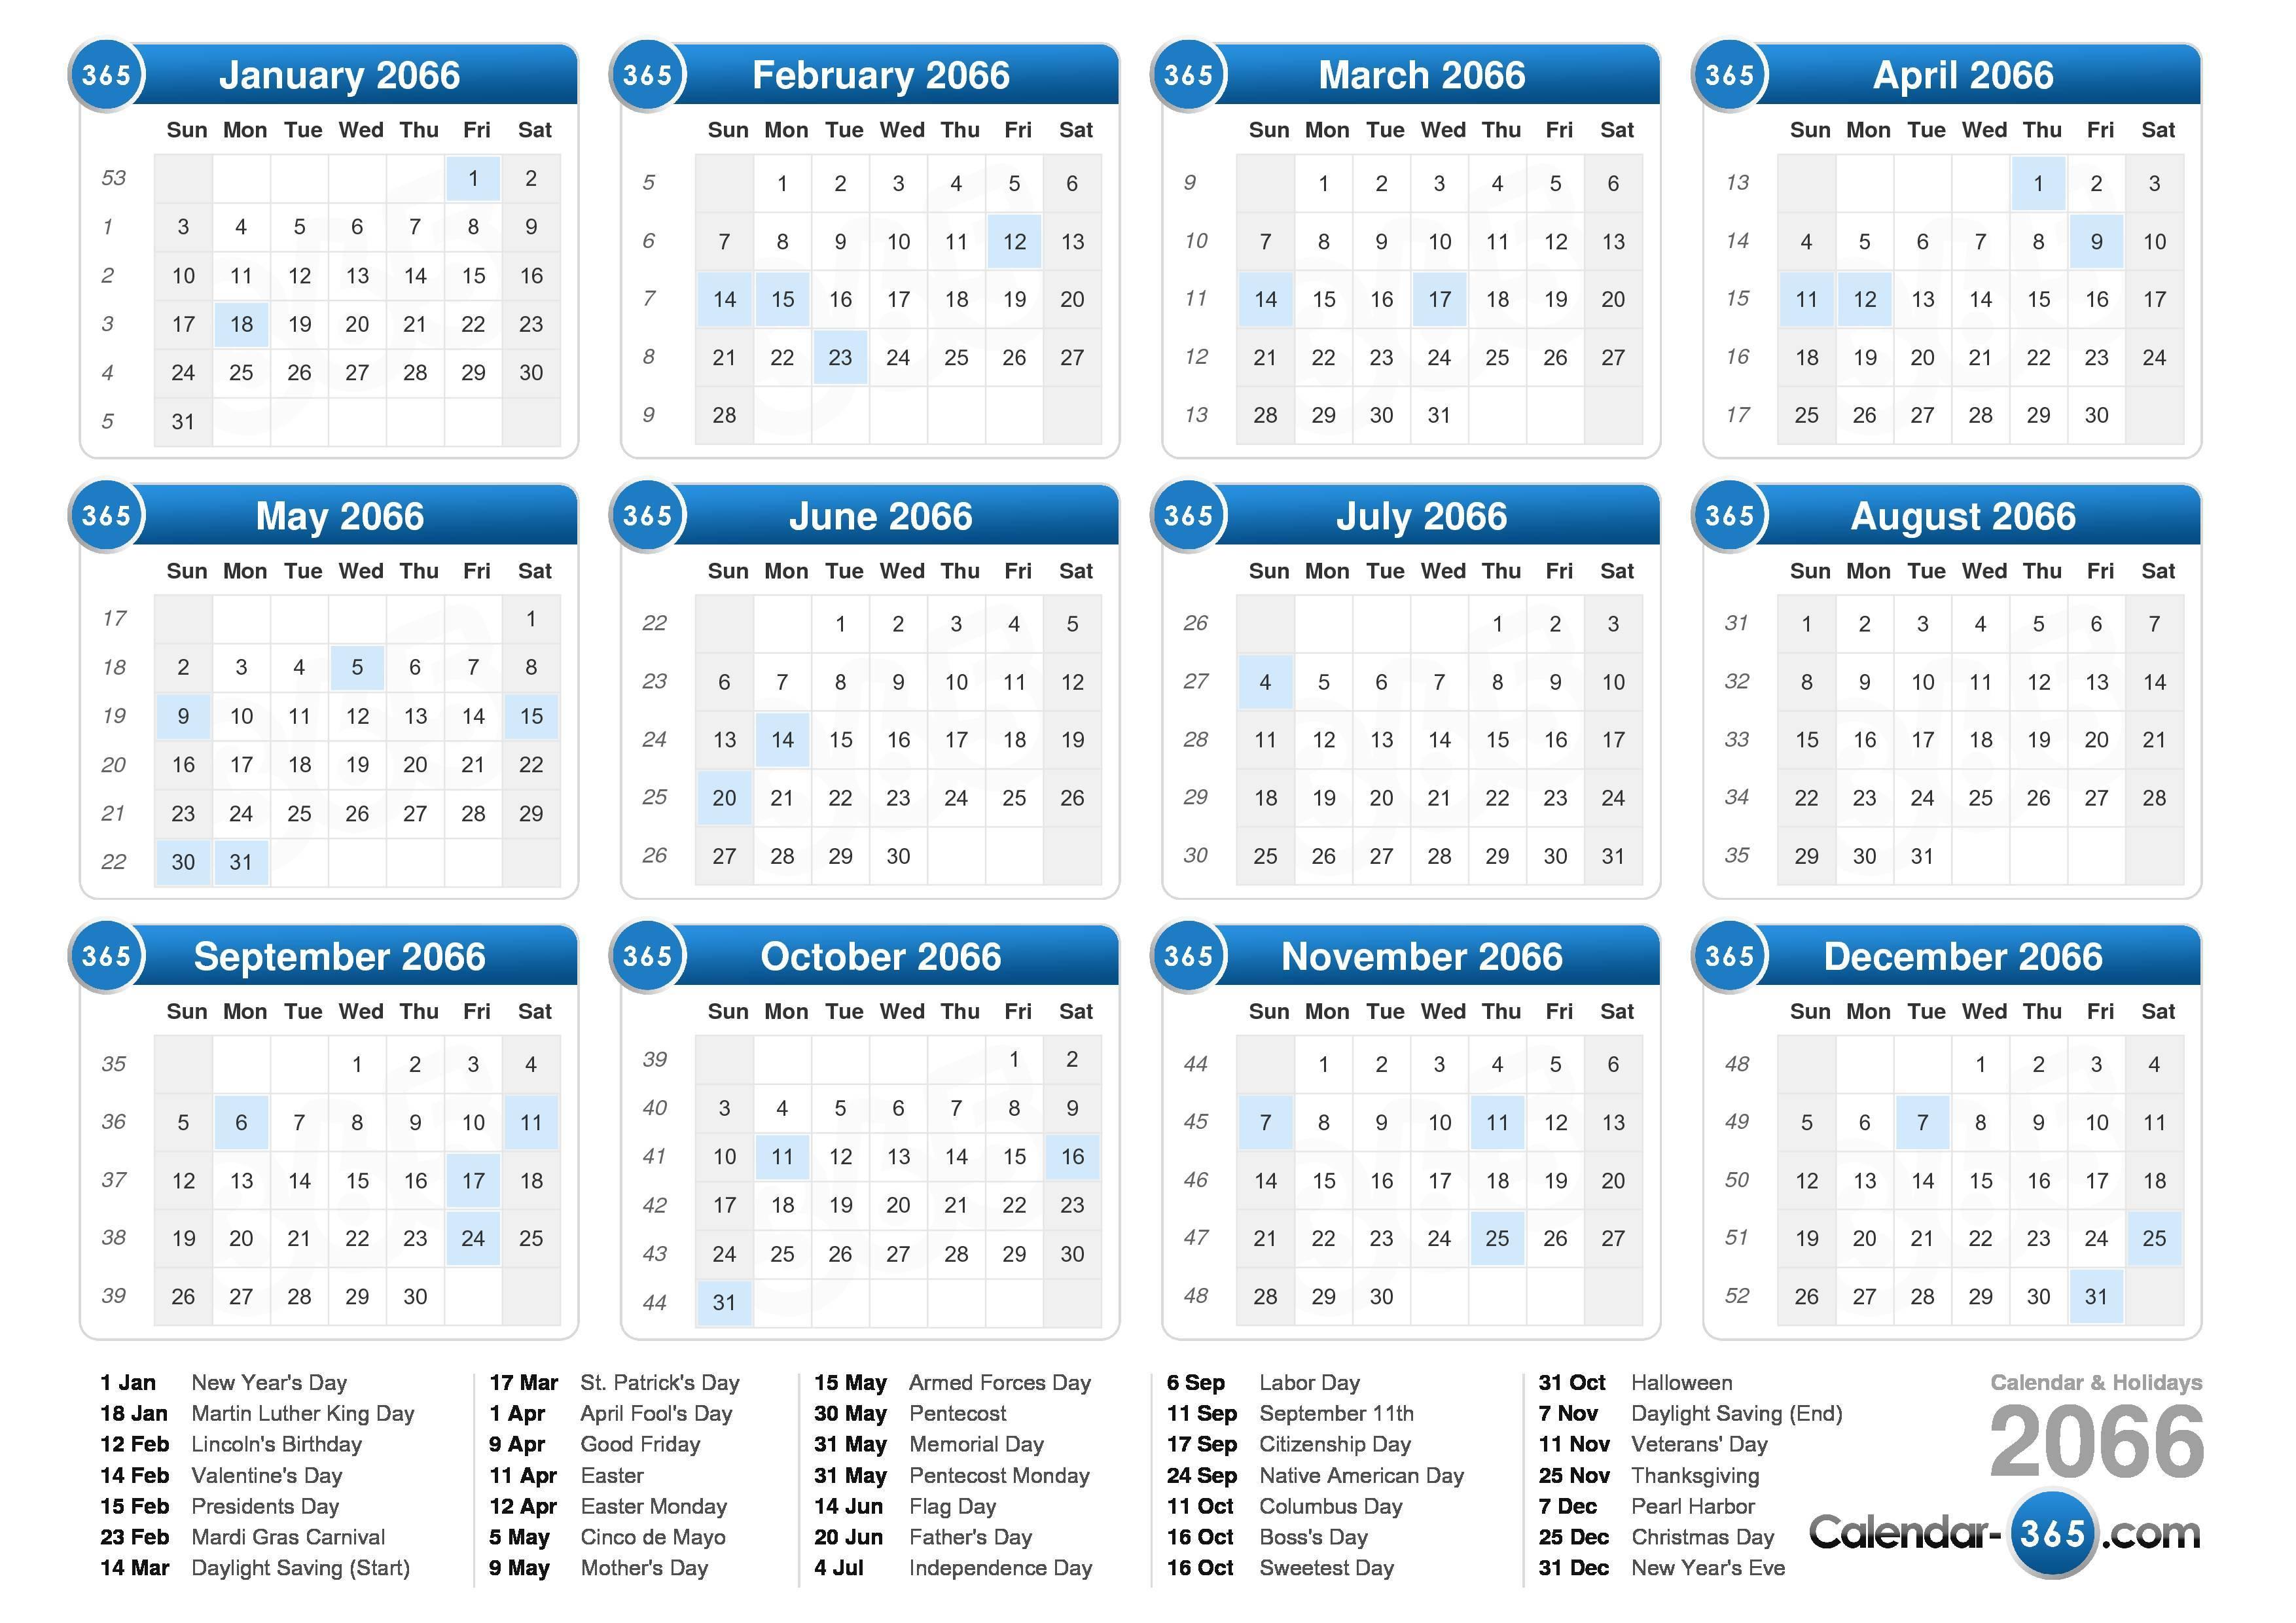 Free Calendars To Print At Home | Calendar Template 2016